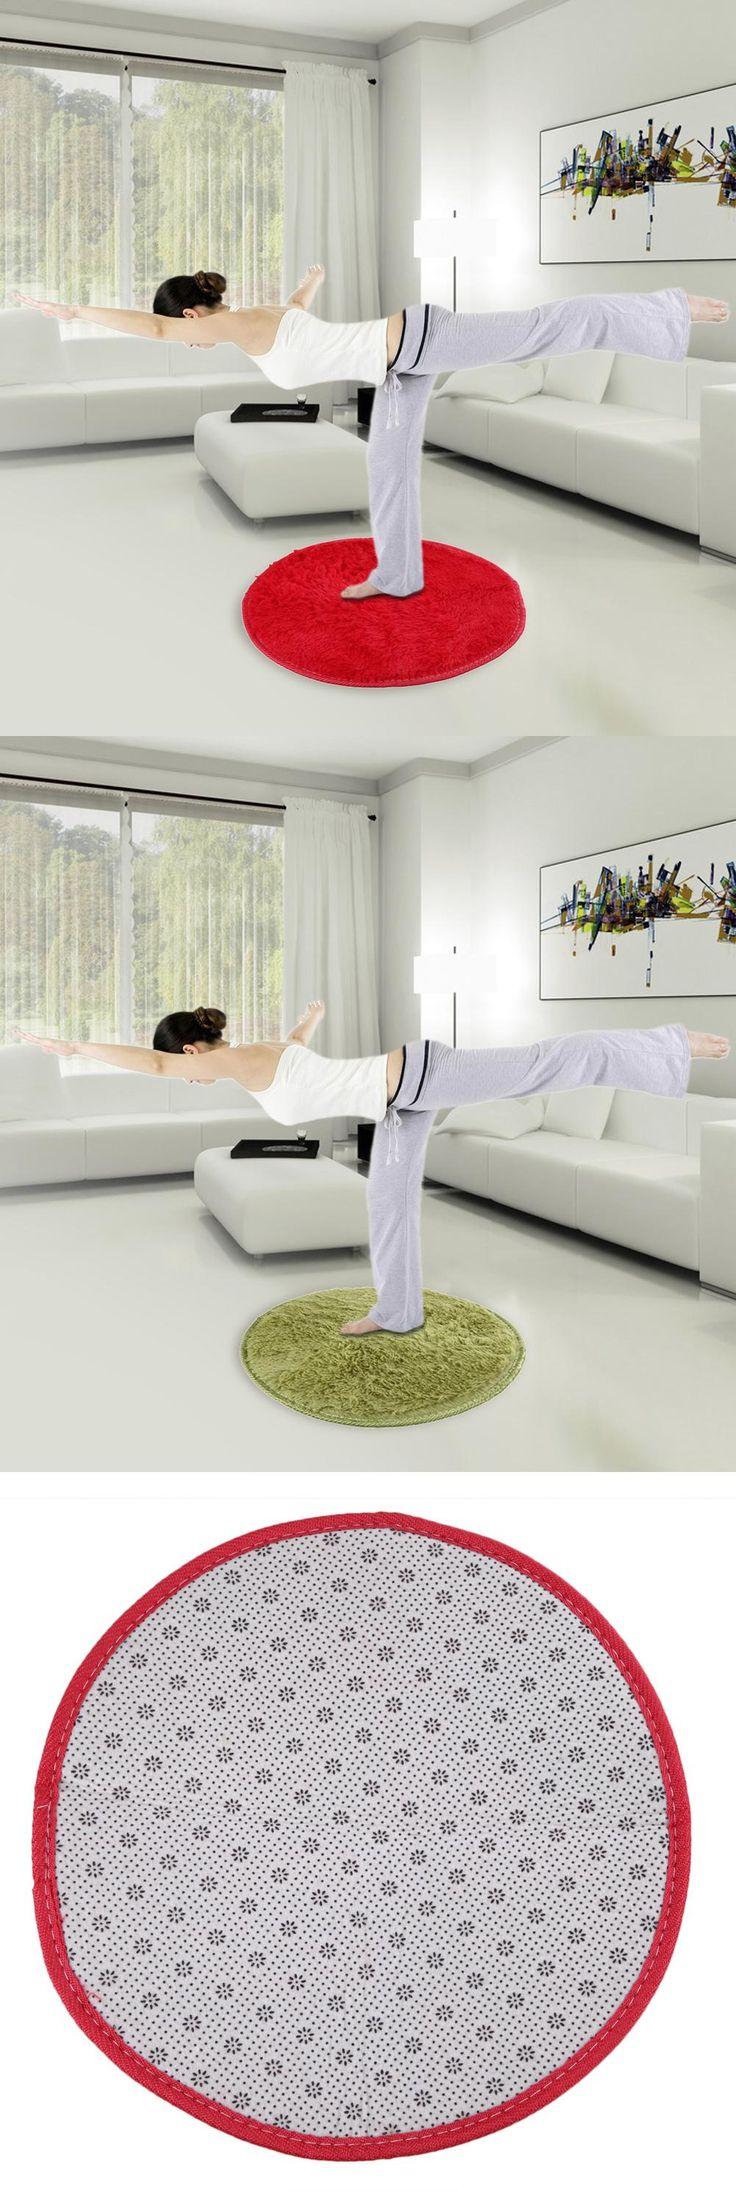 [Visit to Buy] 1pcs Plush Mat 42cm Fluffy Rug Round Foam Rug Non Slip Shower Bedroom Mat Door Floor Carpet 9 Colors Home Textile #Advertisement